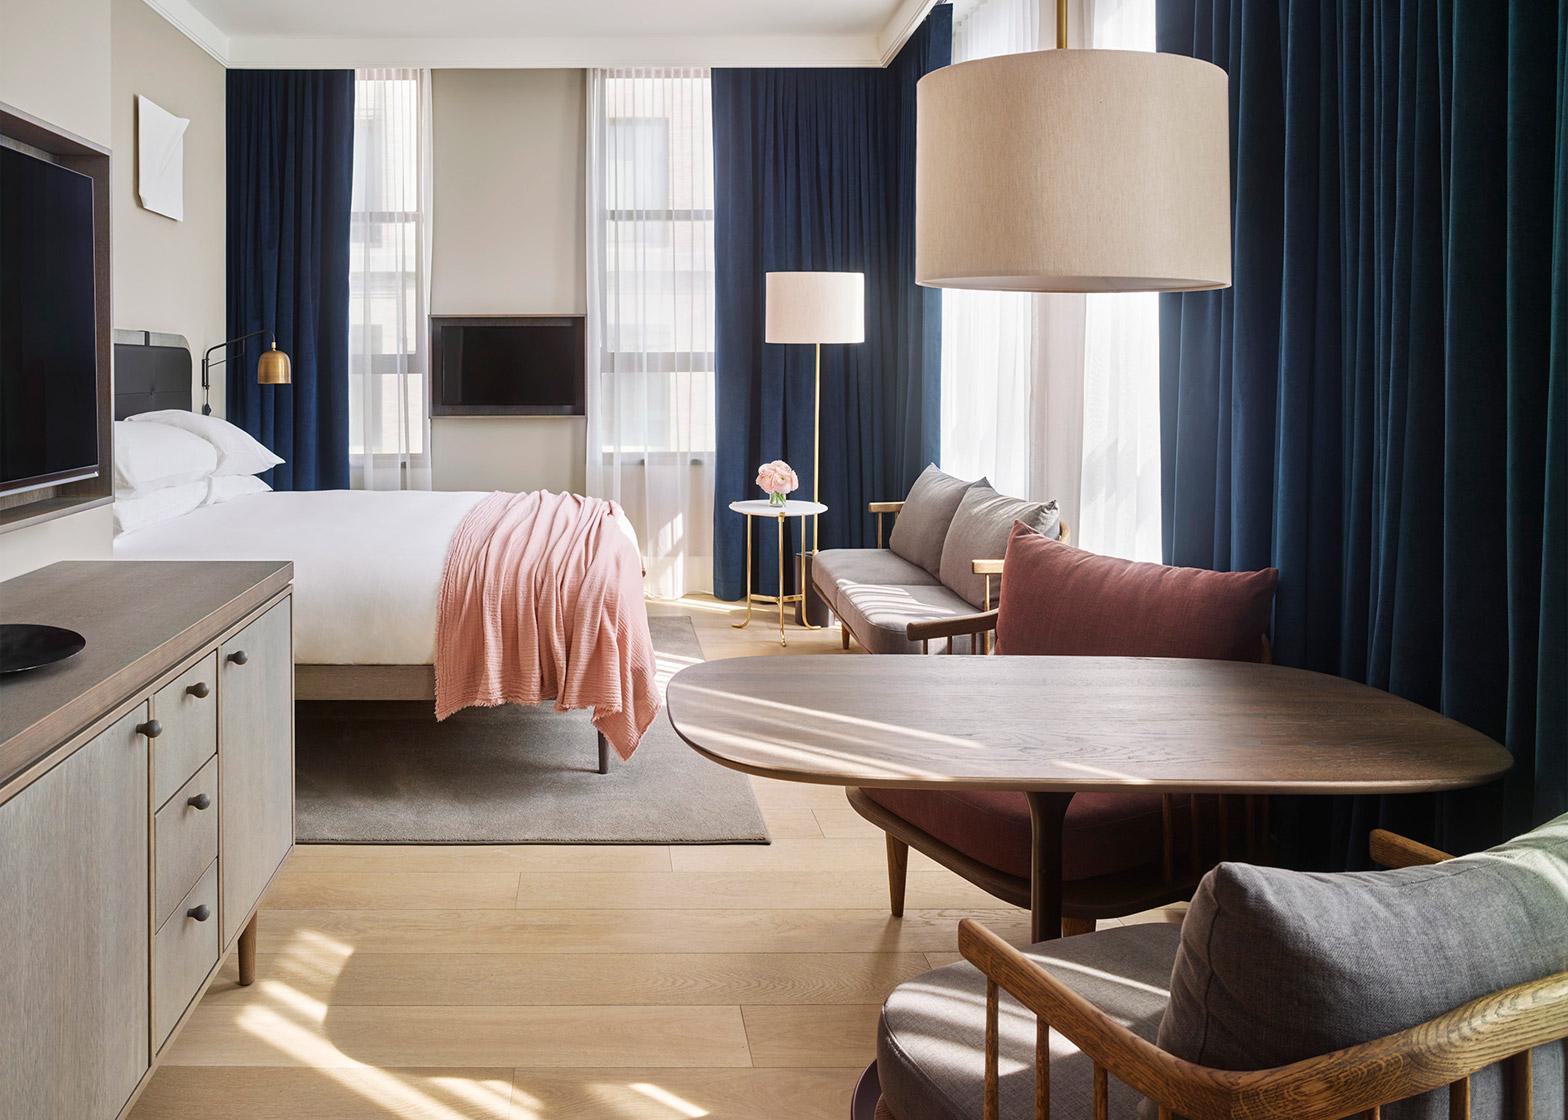 11 Howard - Scandinavian designed luxury boutique Hotel